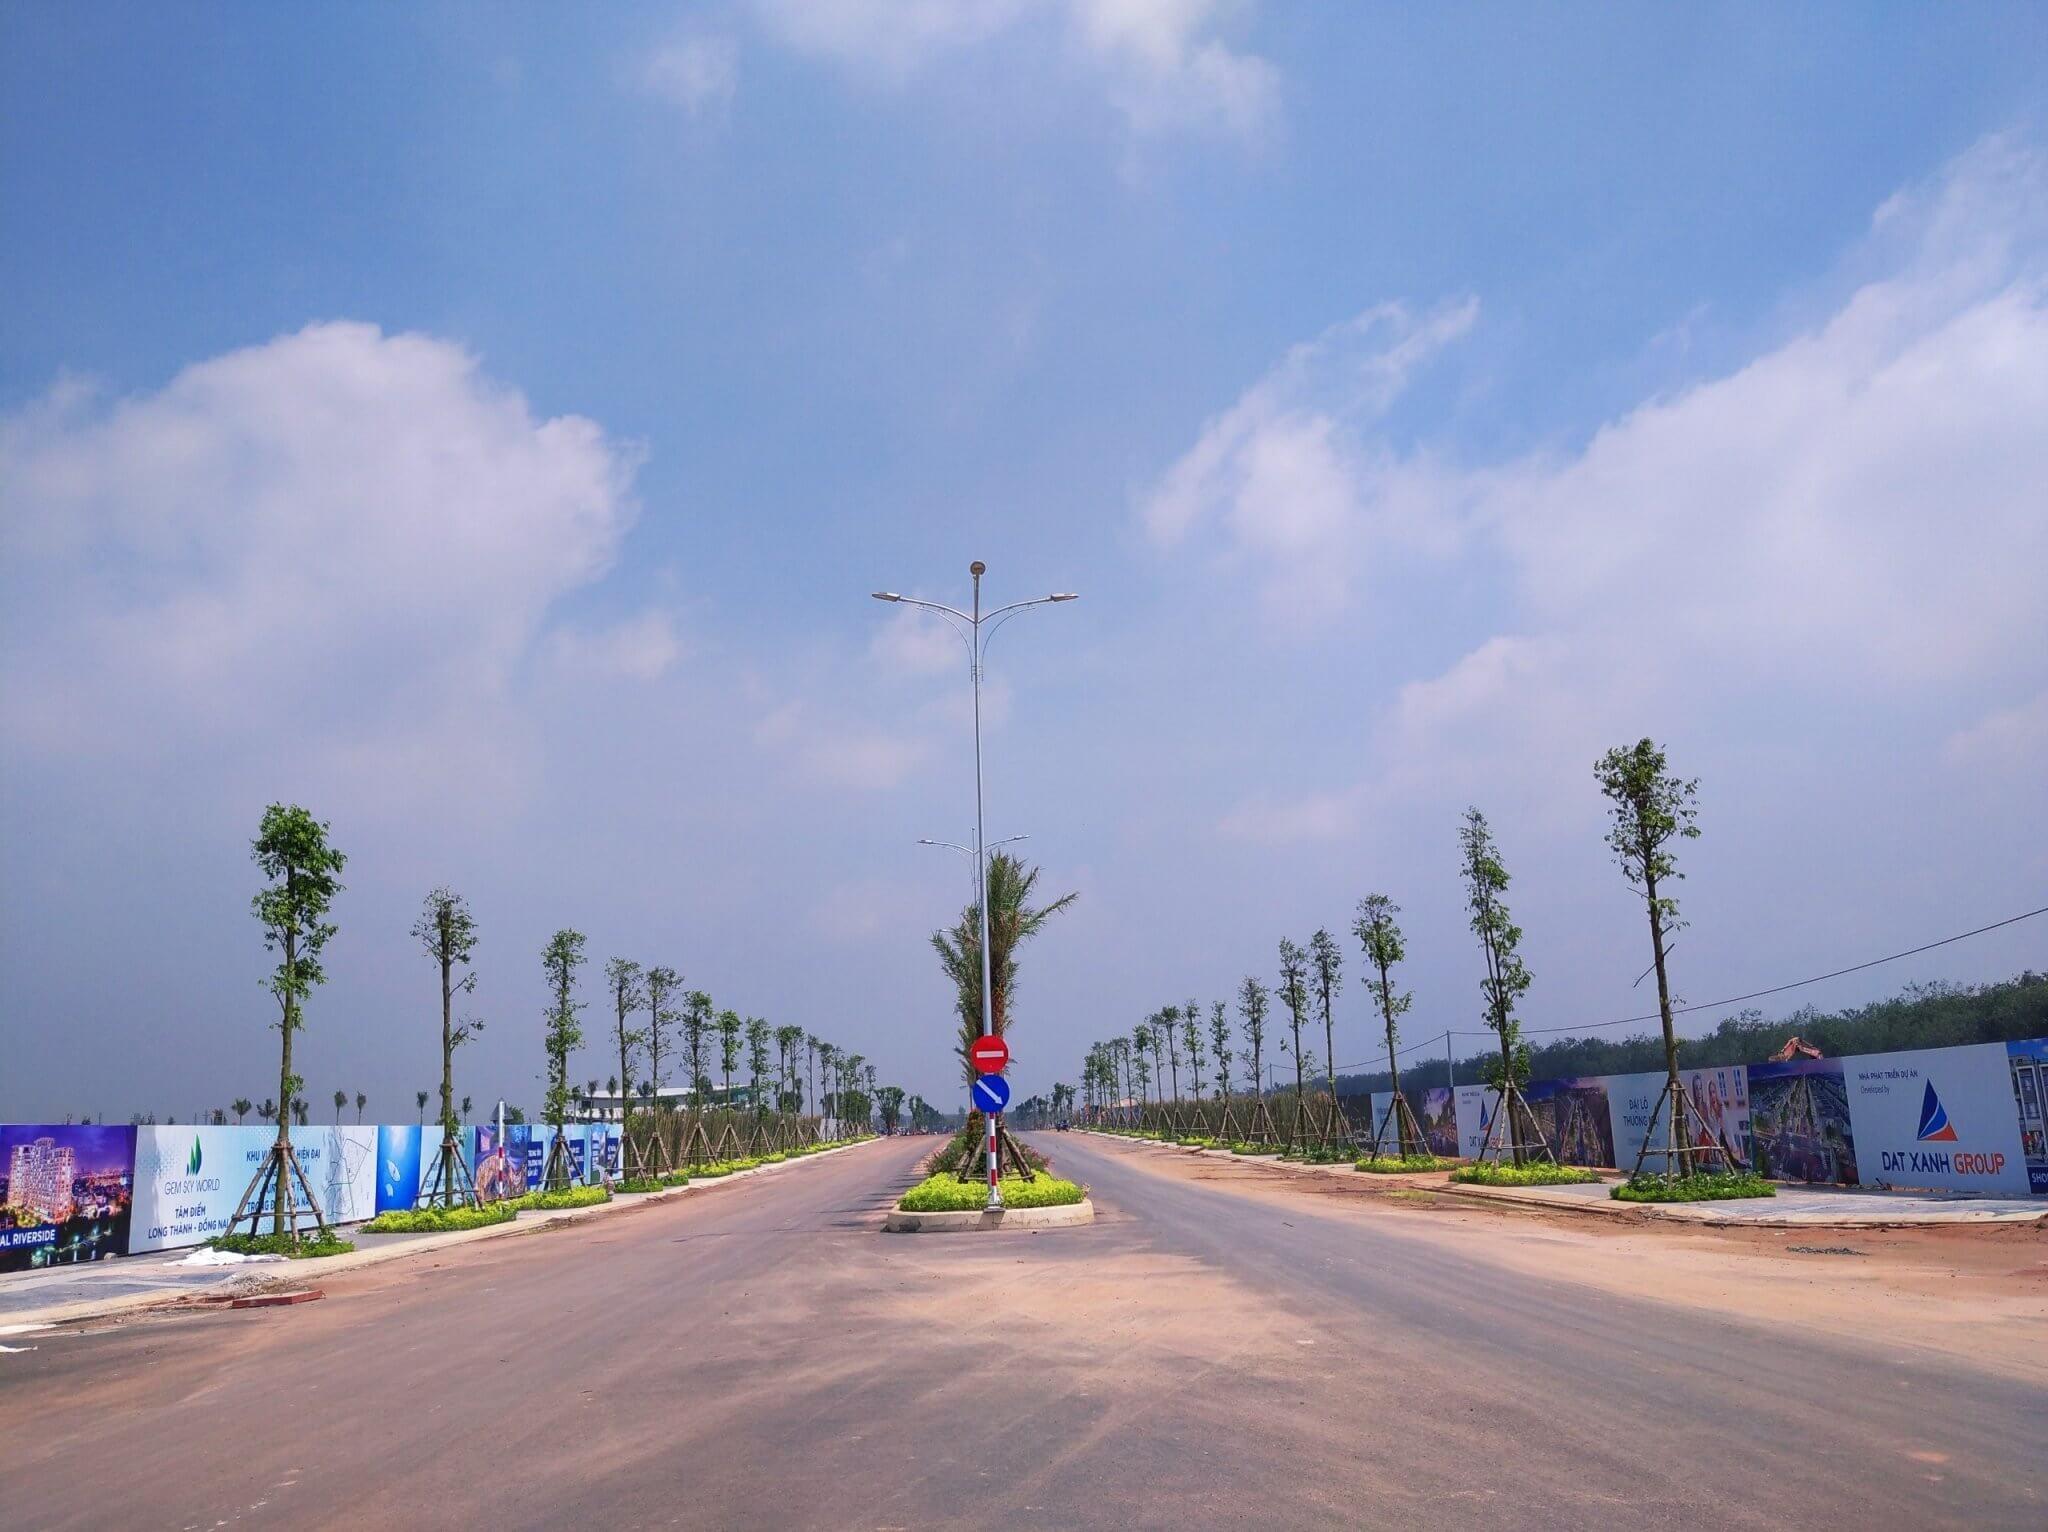 truc-duong-noi-khu-Gold-Silk-Boulevard-dang-thi-cong-hoan-thien-du-an-Gem-Sky-World-dat-xanh-Long-Thanh